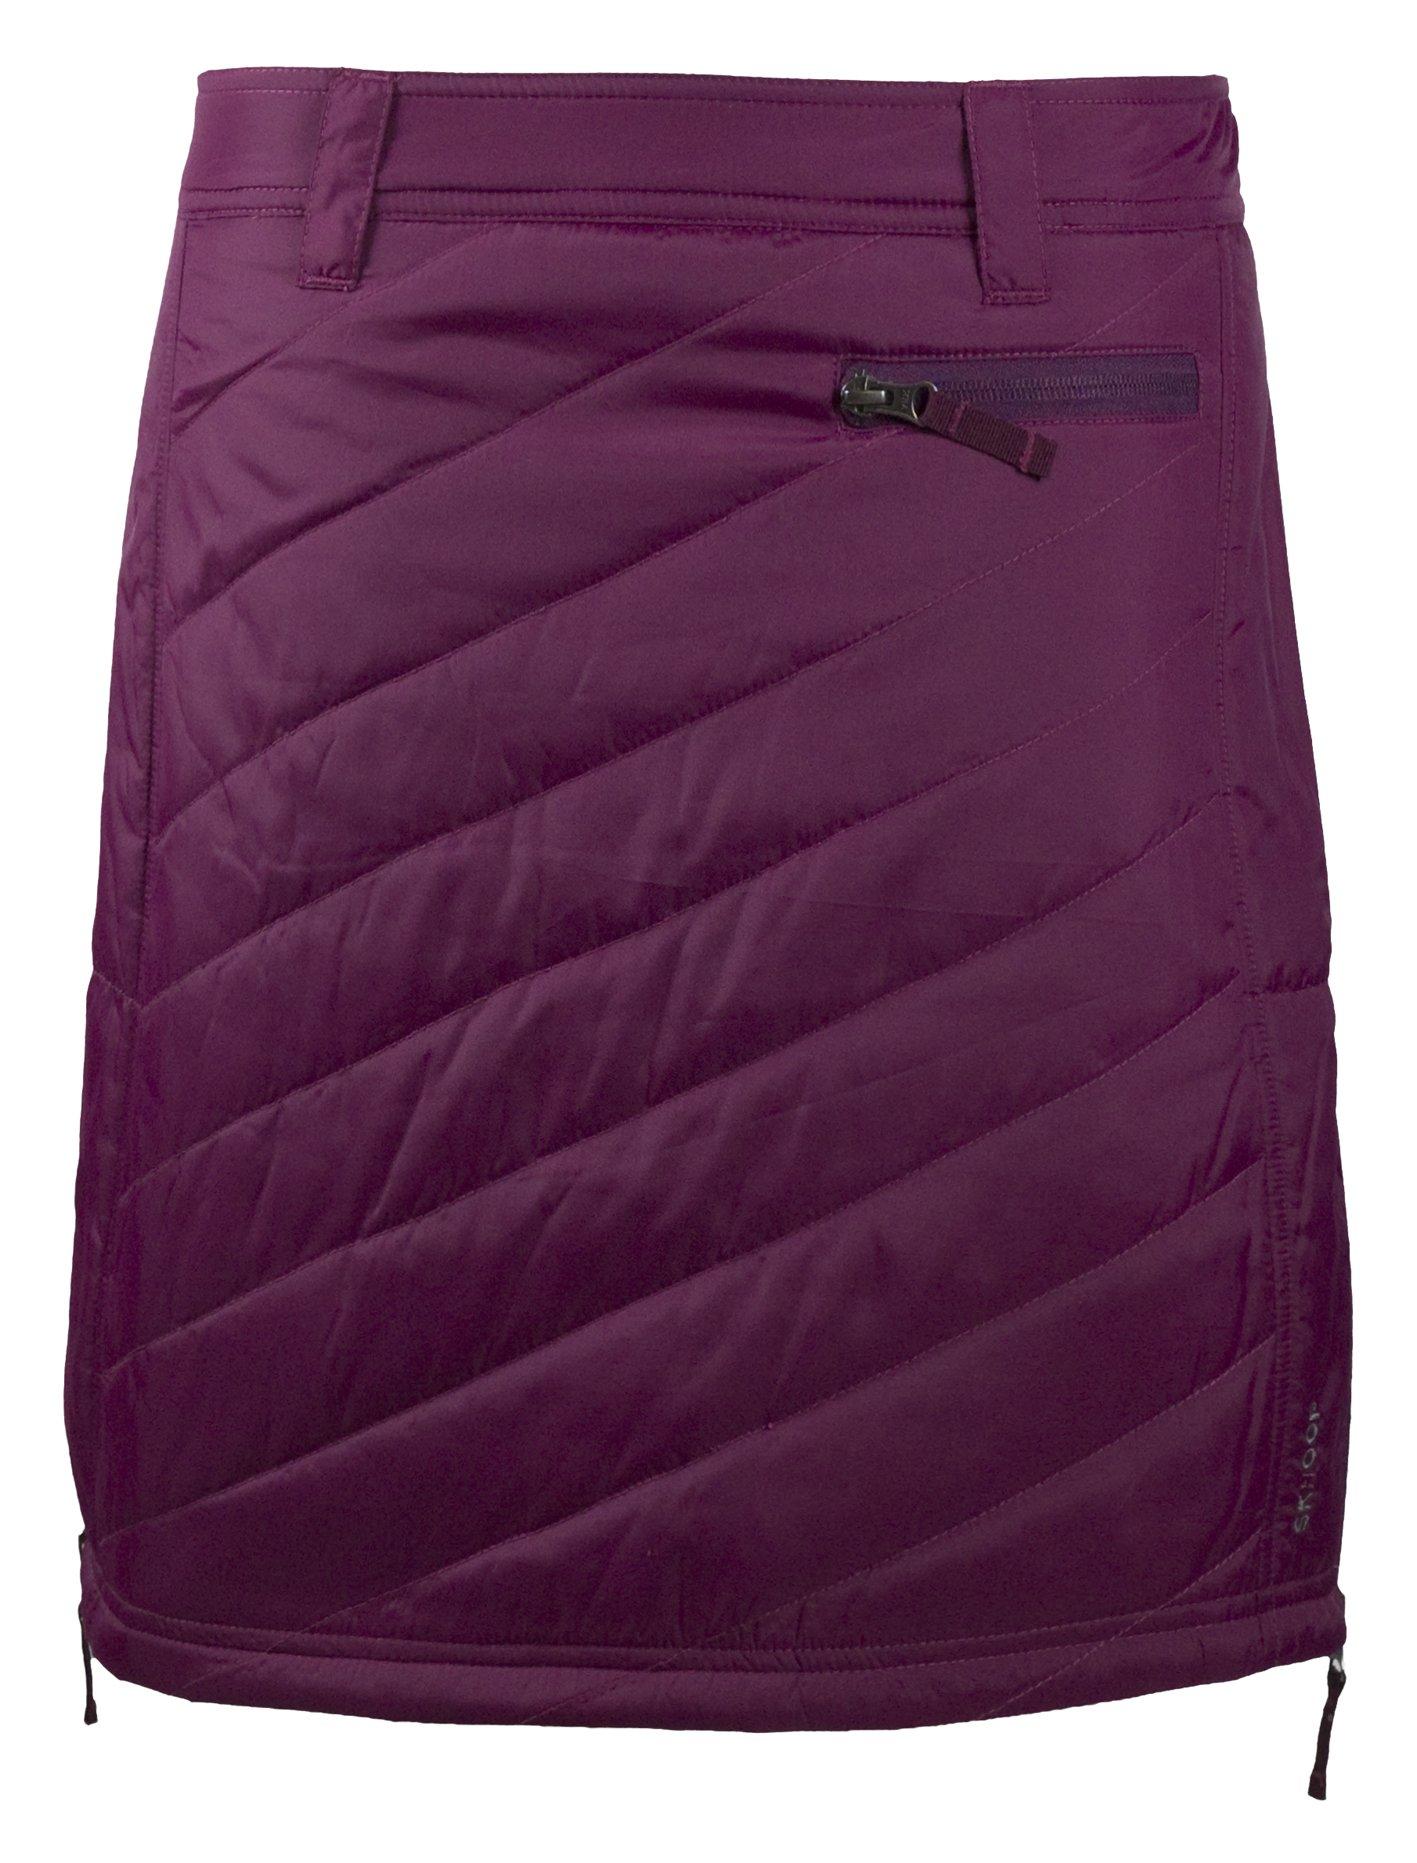 Skhoop Sandy Short Skirt, Bordeaux, X-Large